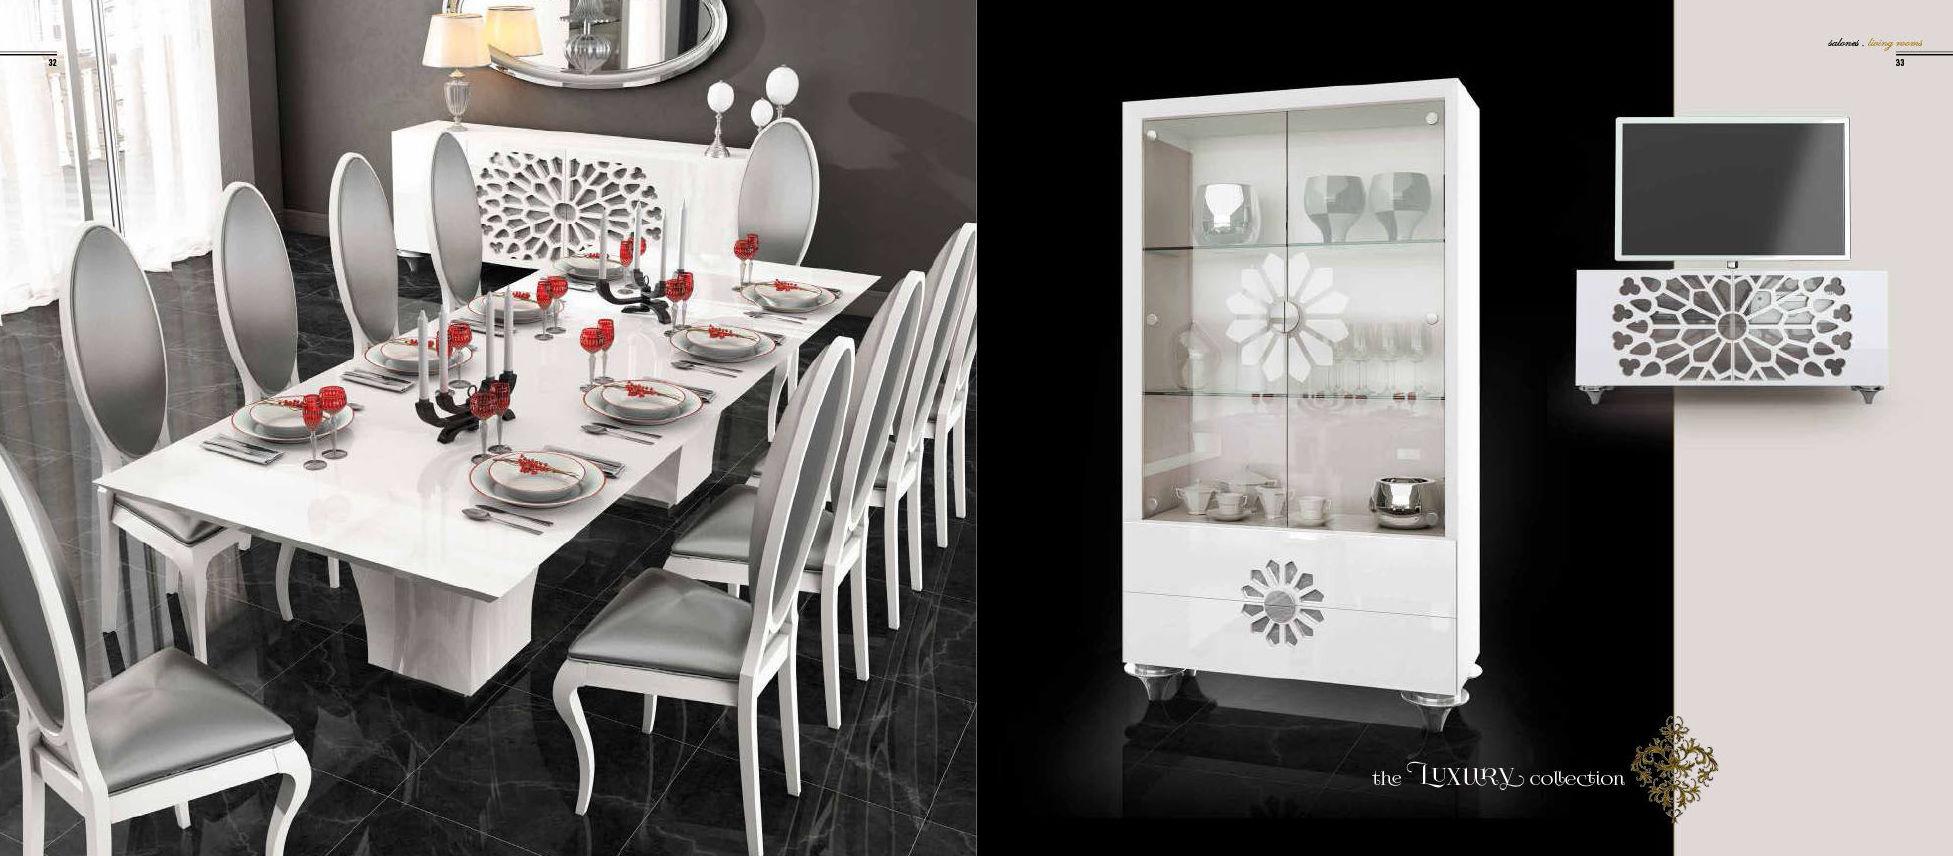 Furniture colecci n luxury cat logo de muebles y sof s de - Muebles y complementos ...